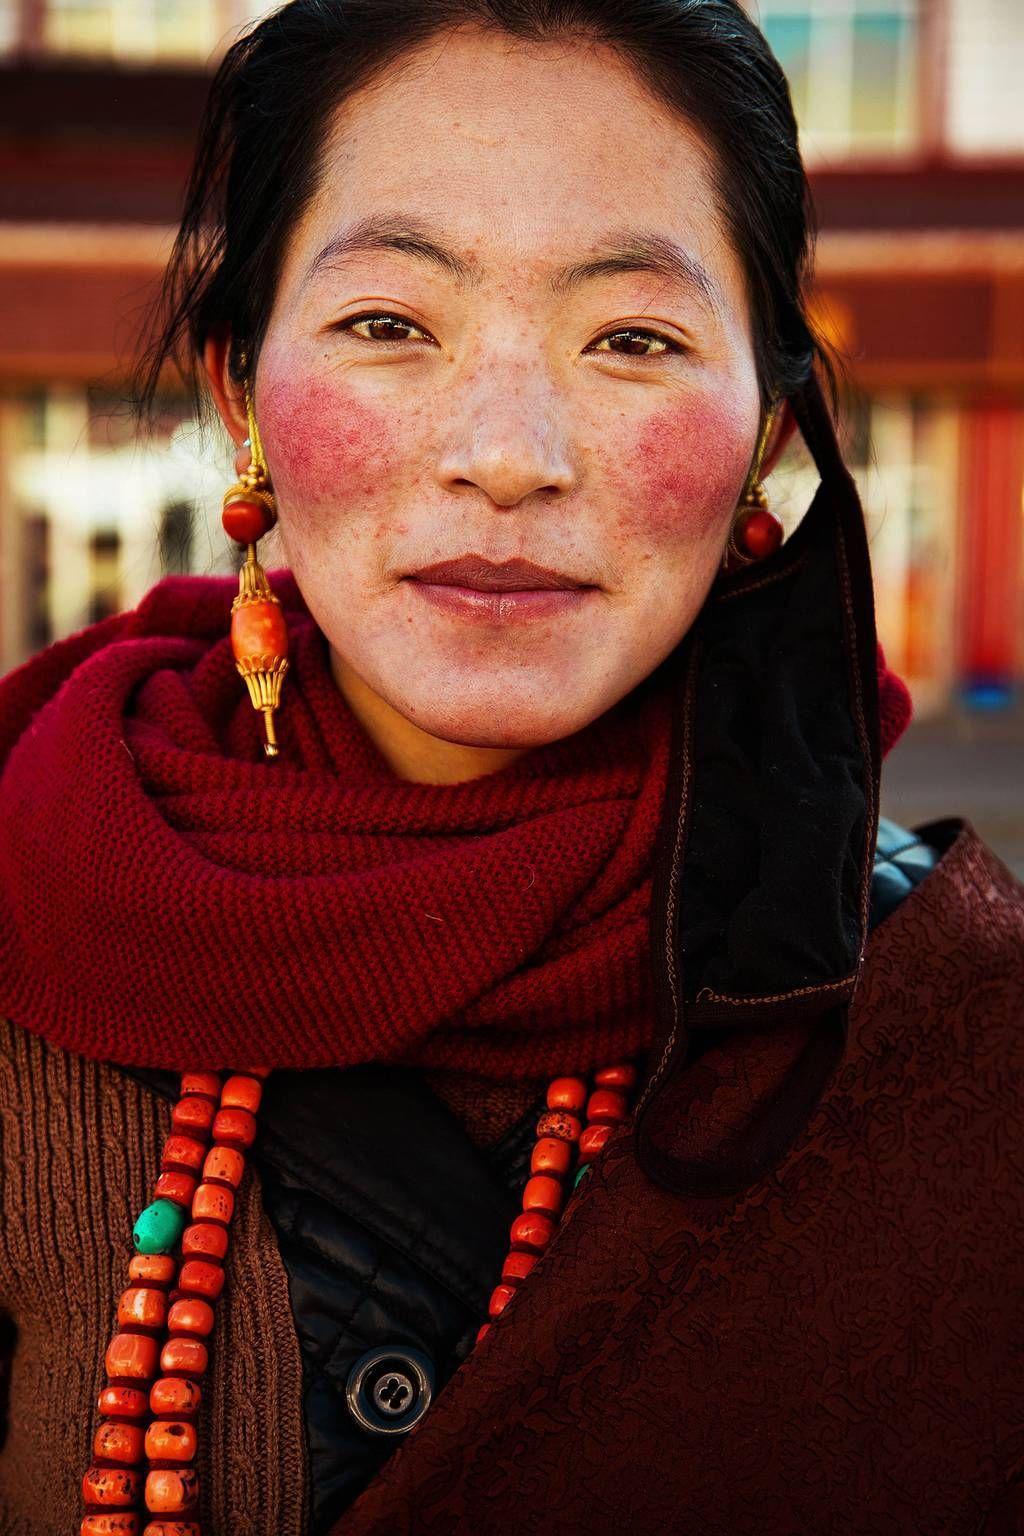 Woman from Platoul Tibetan, China, by Mihaela Noroc | Тибетская женщина, Китай. Фотограф Михаэла Норок